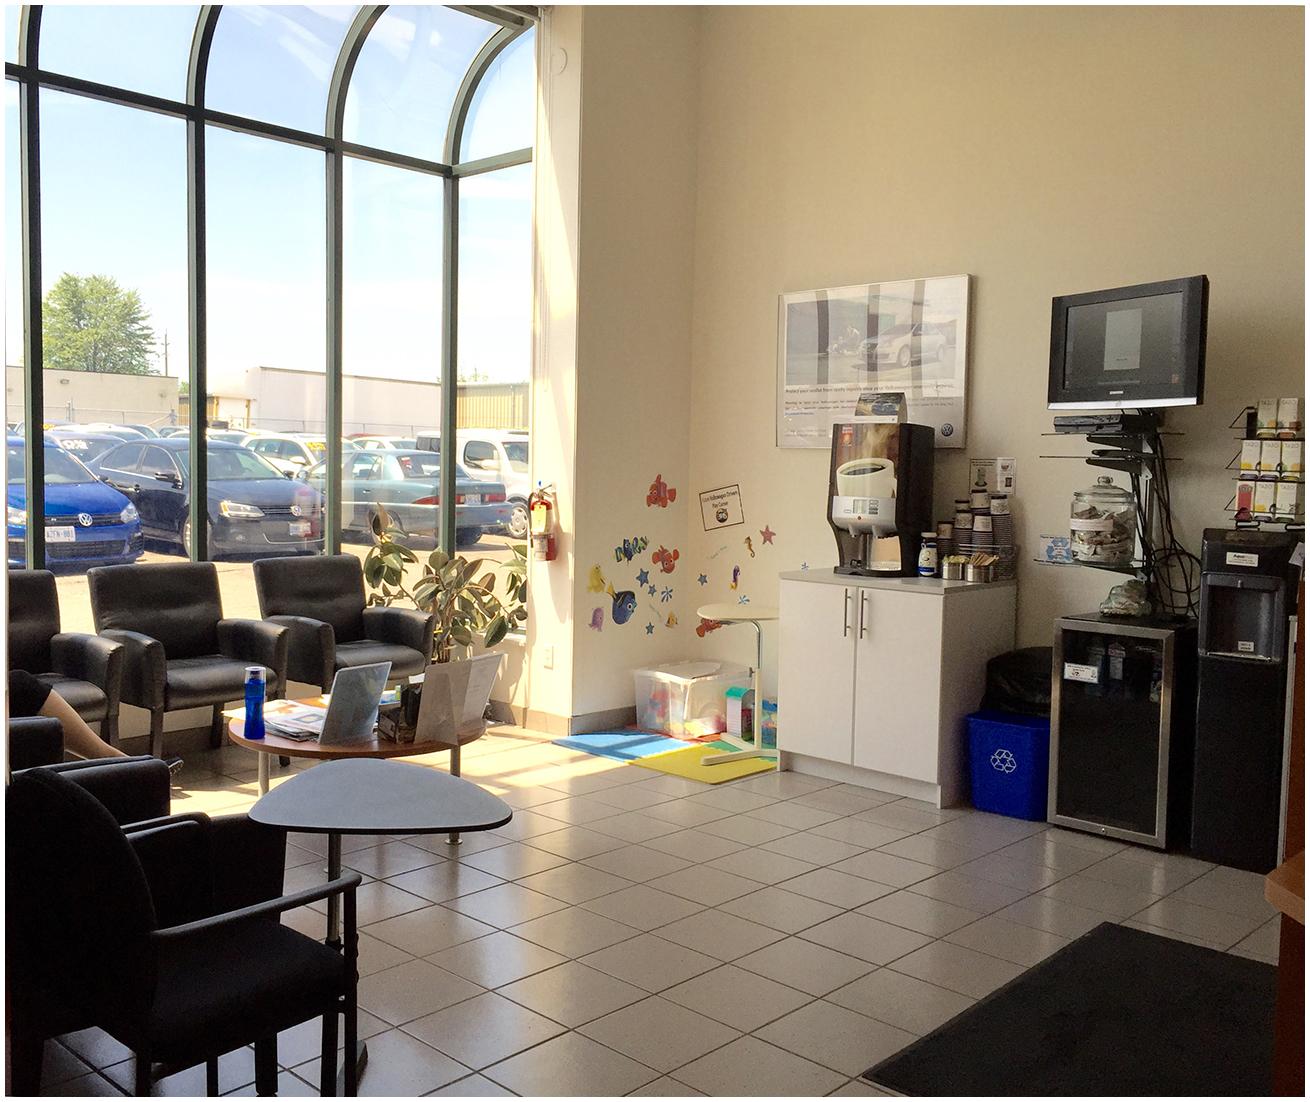 Brantford Volkswagen service waiting area